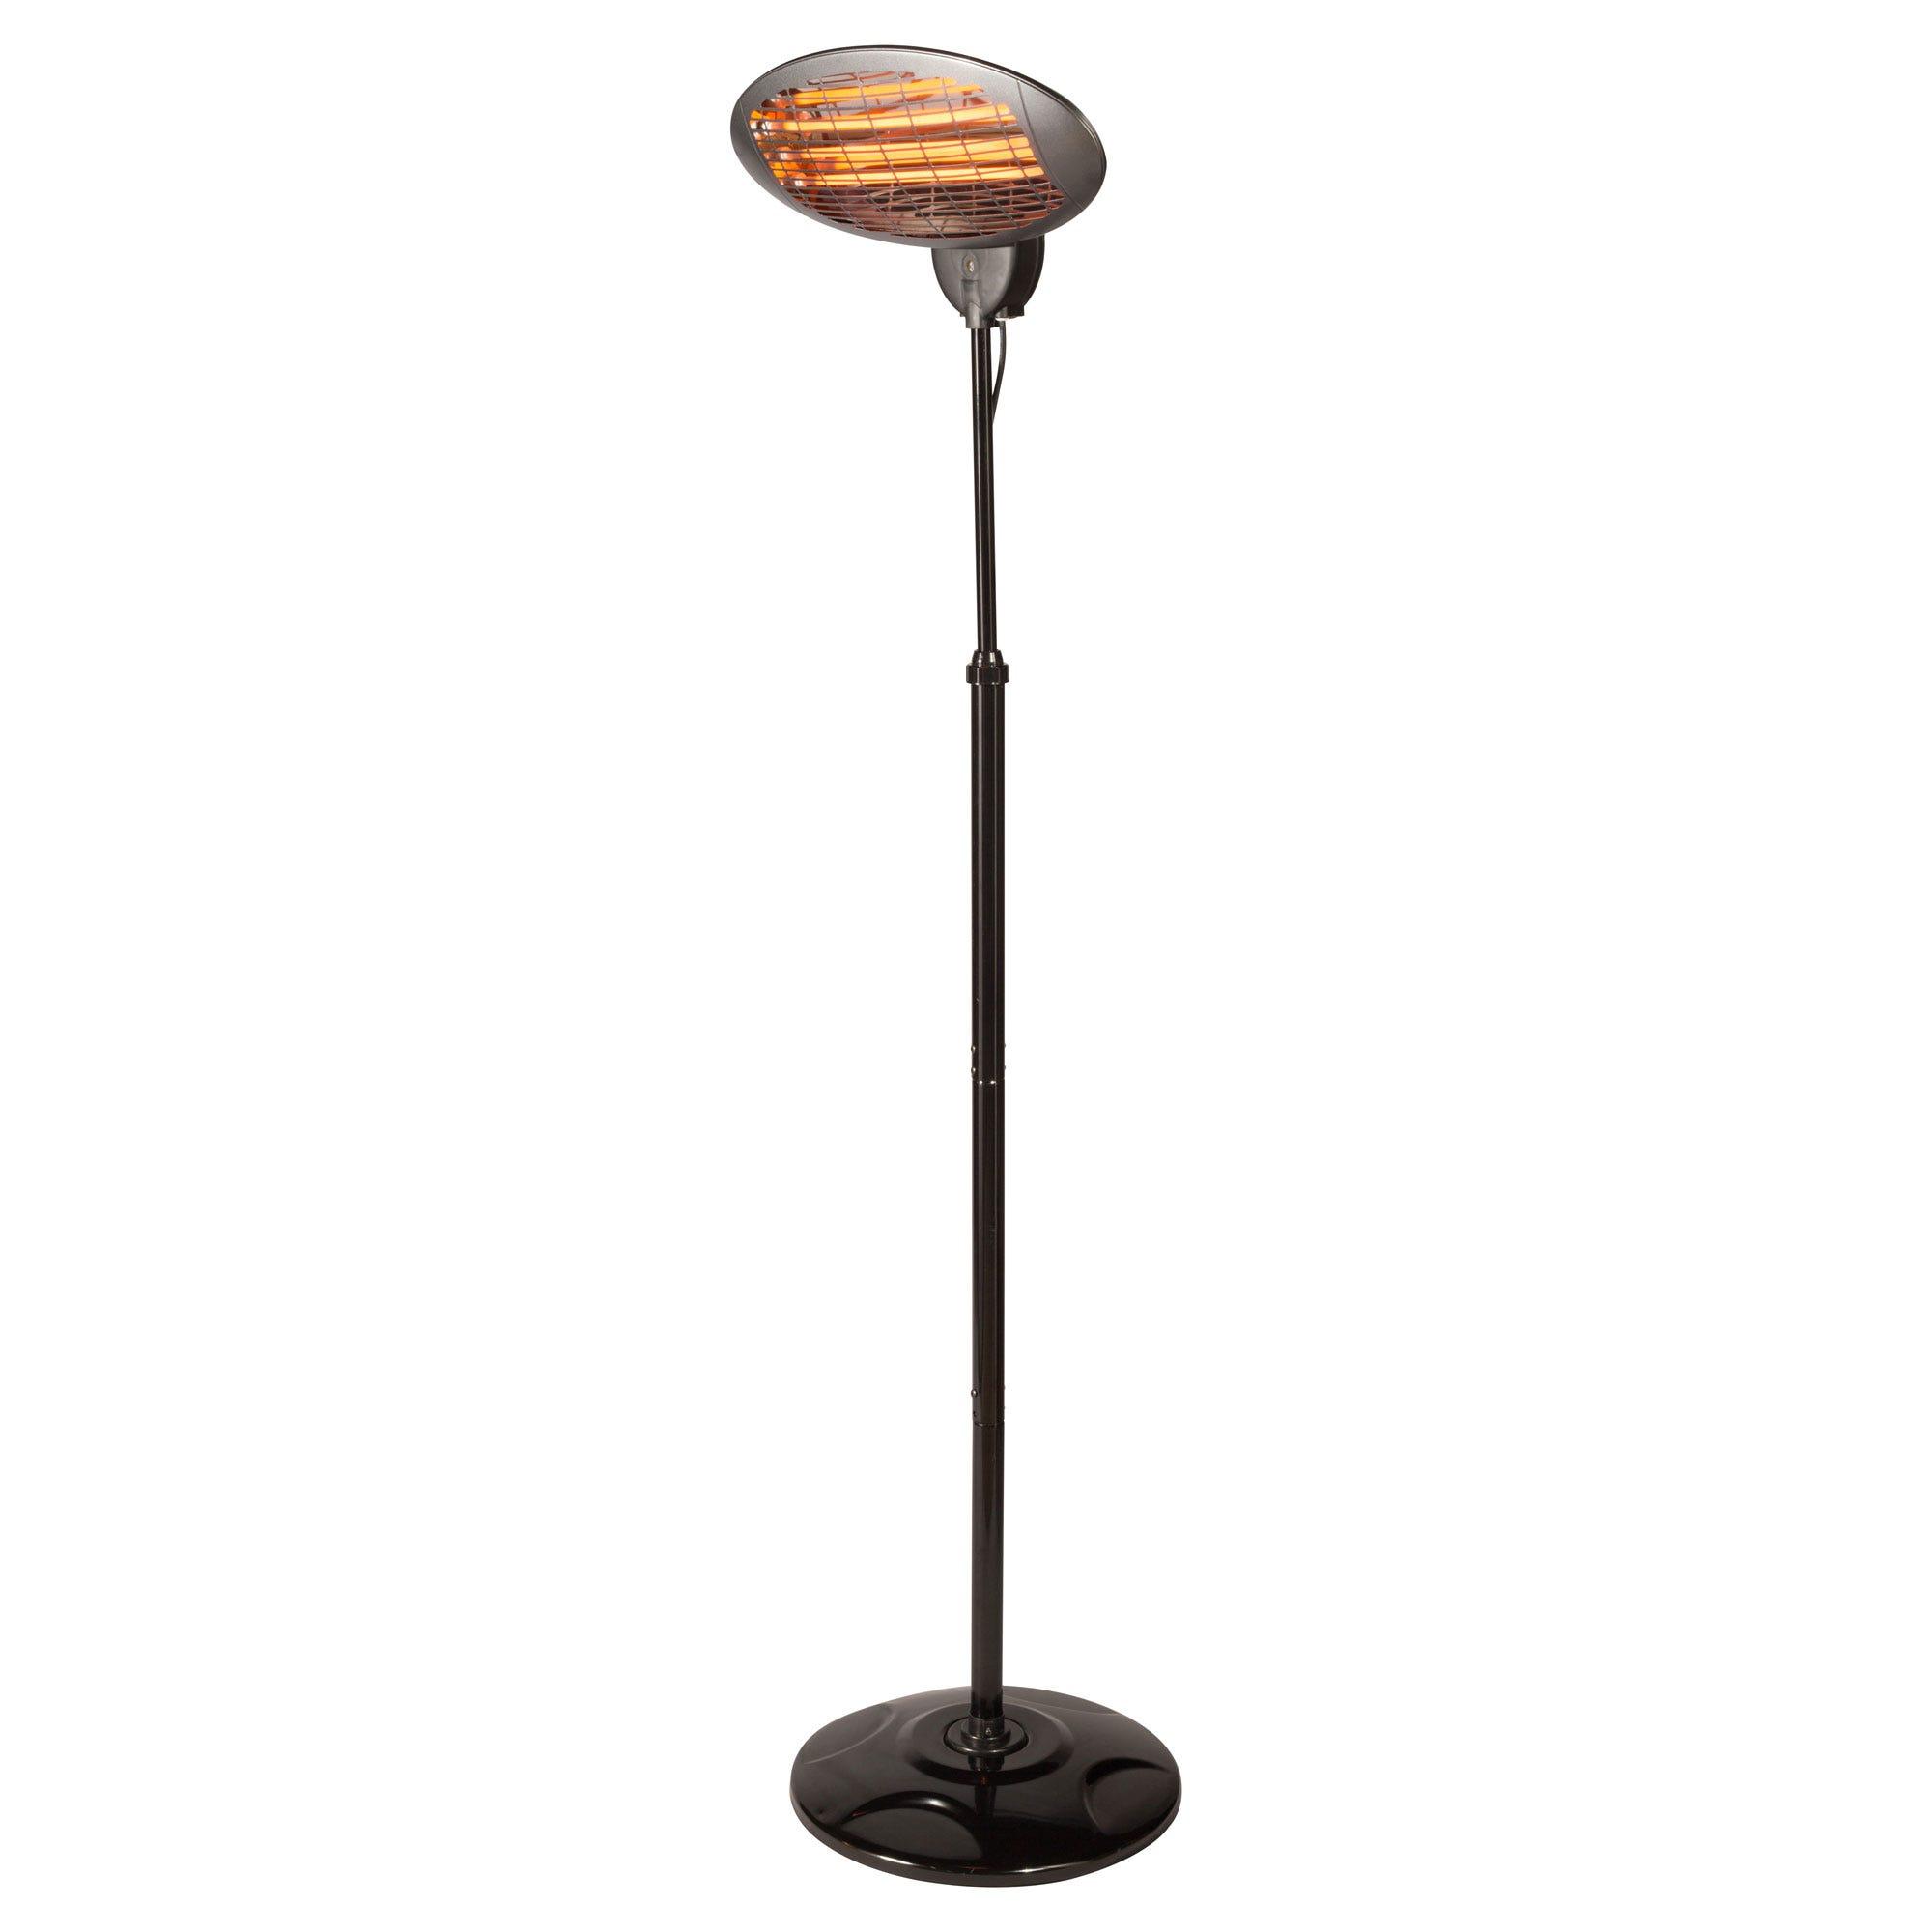 connect it 2000w halogen patio heater. Black Bedroom Furniture Sets. Home Design Ideas